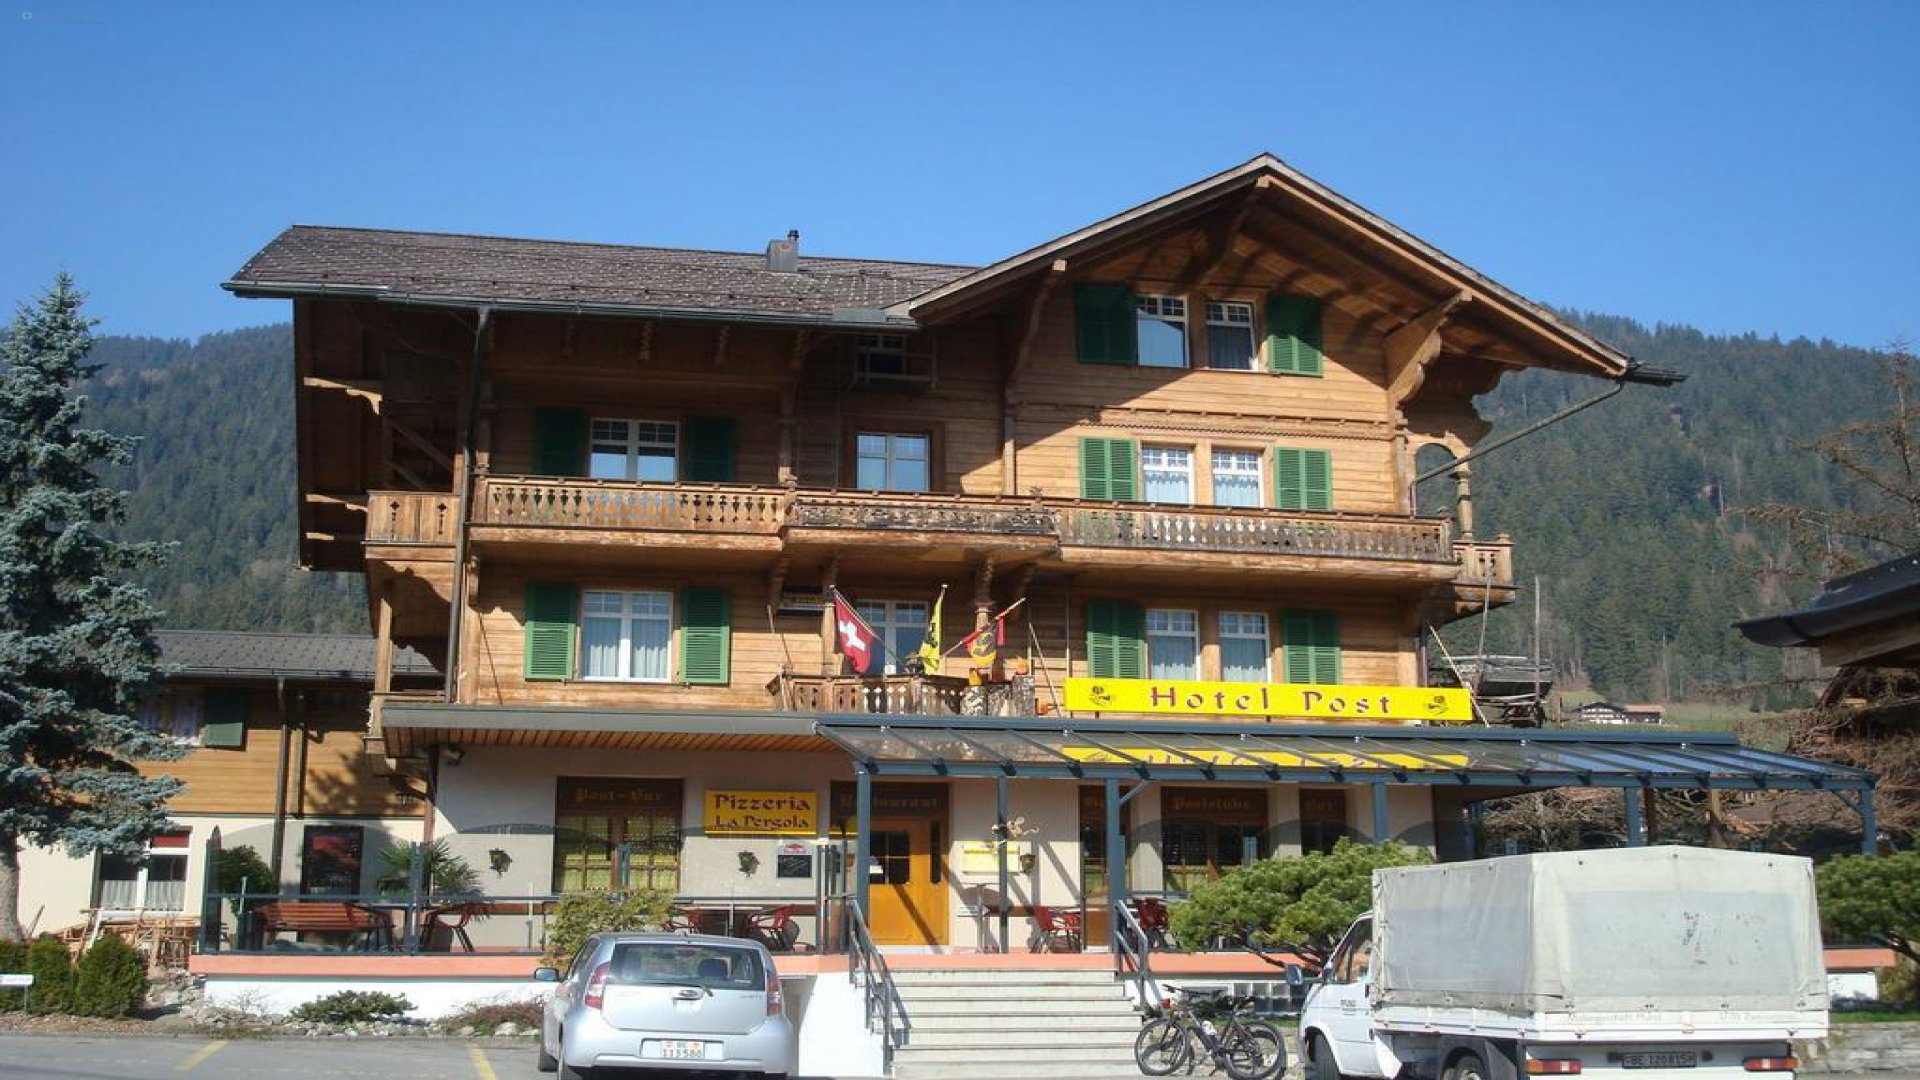 Post Hotel - Vista 1